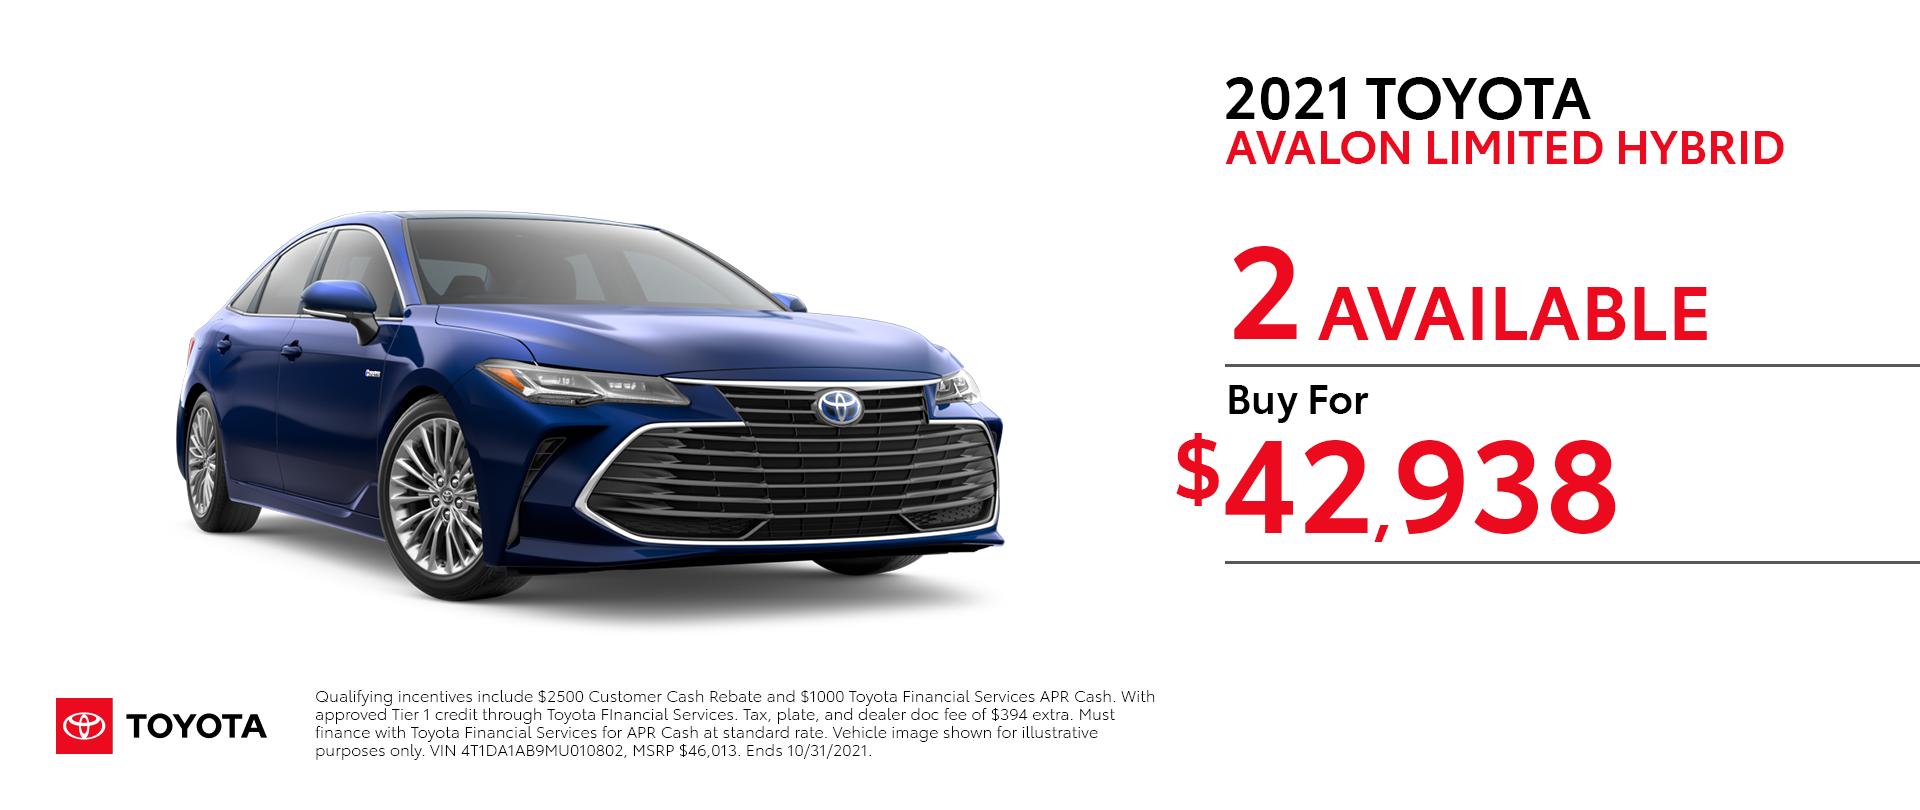 Toyota-Avalon-Limited-Hybrid